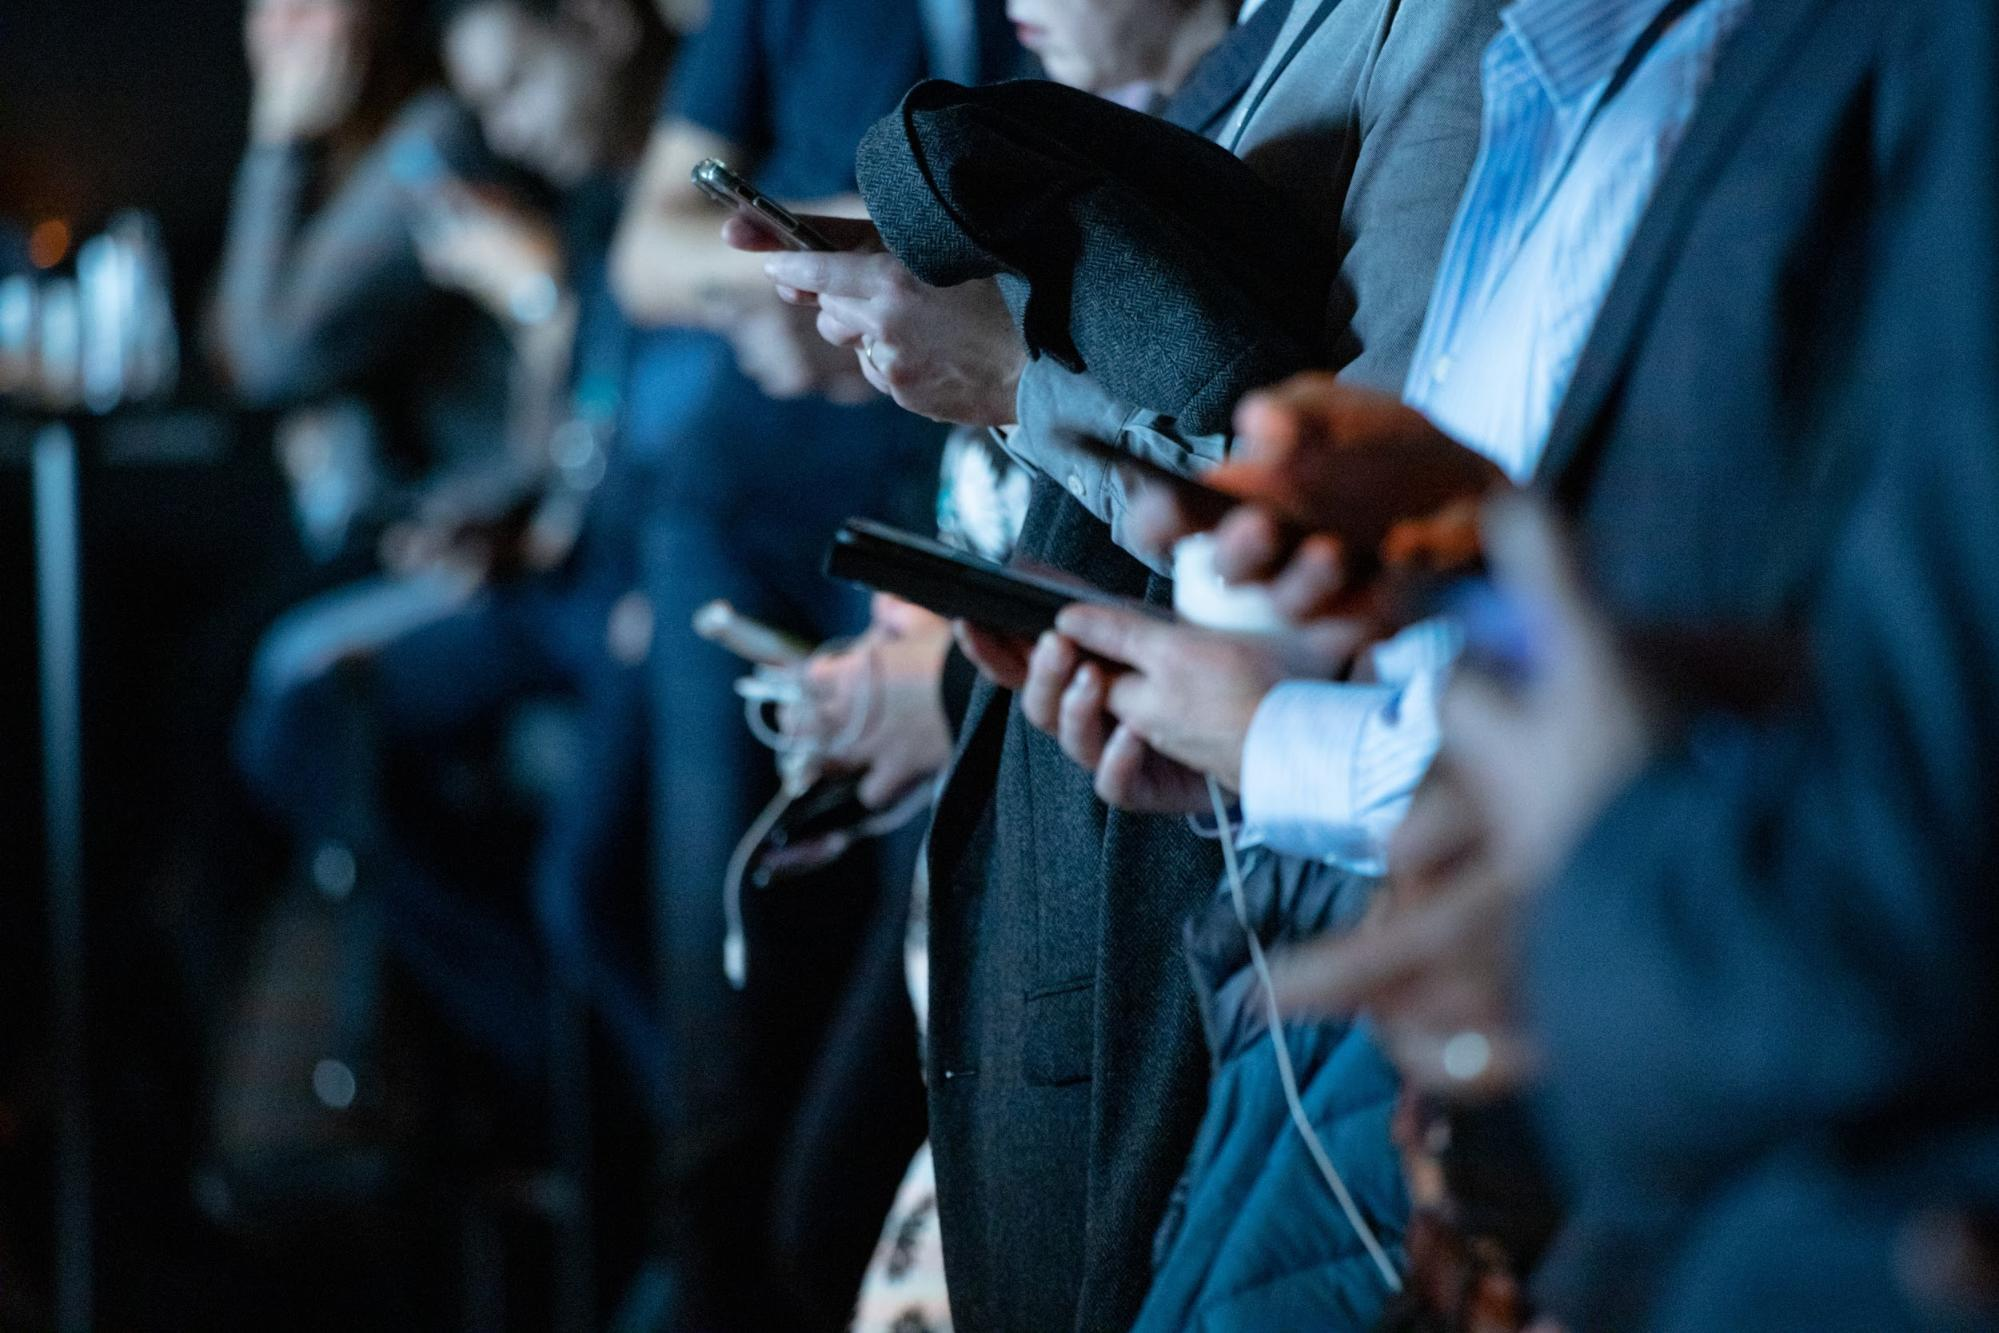 Several individuals using smartphones